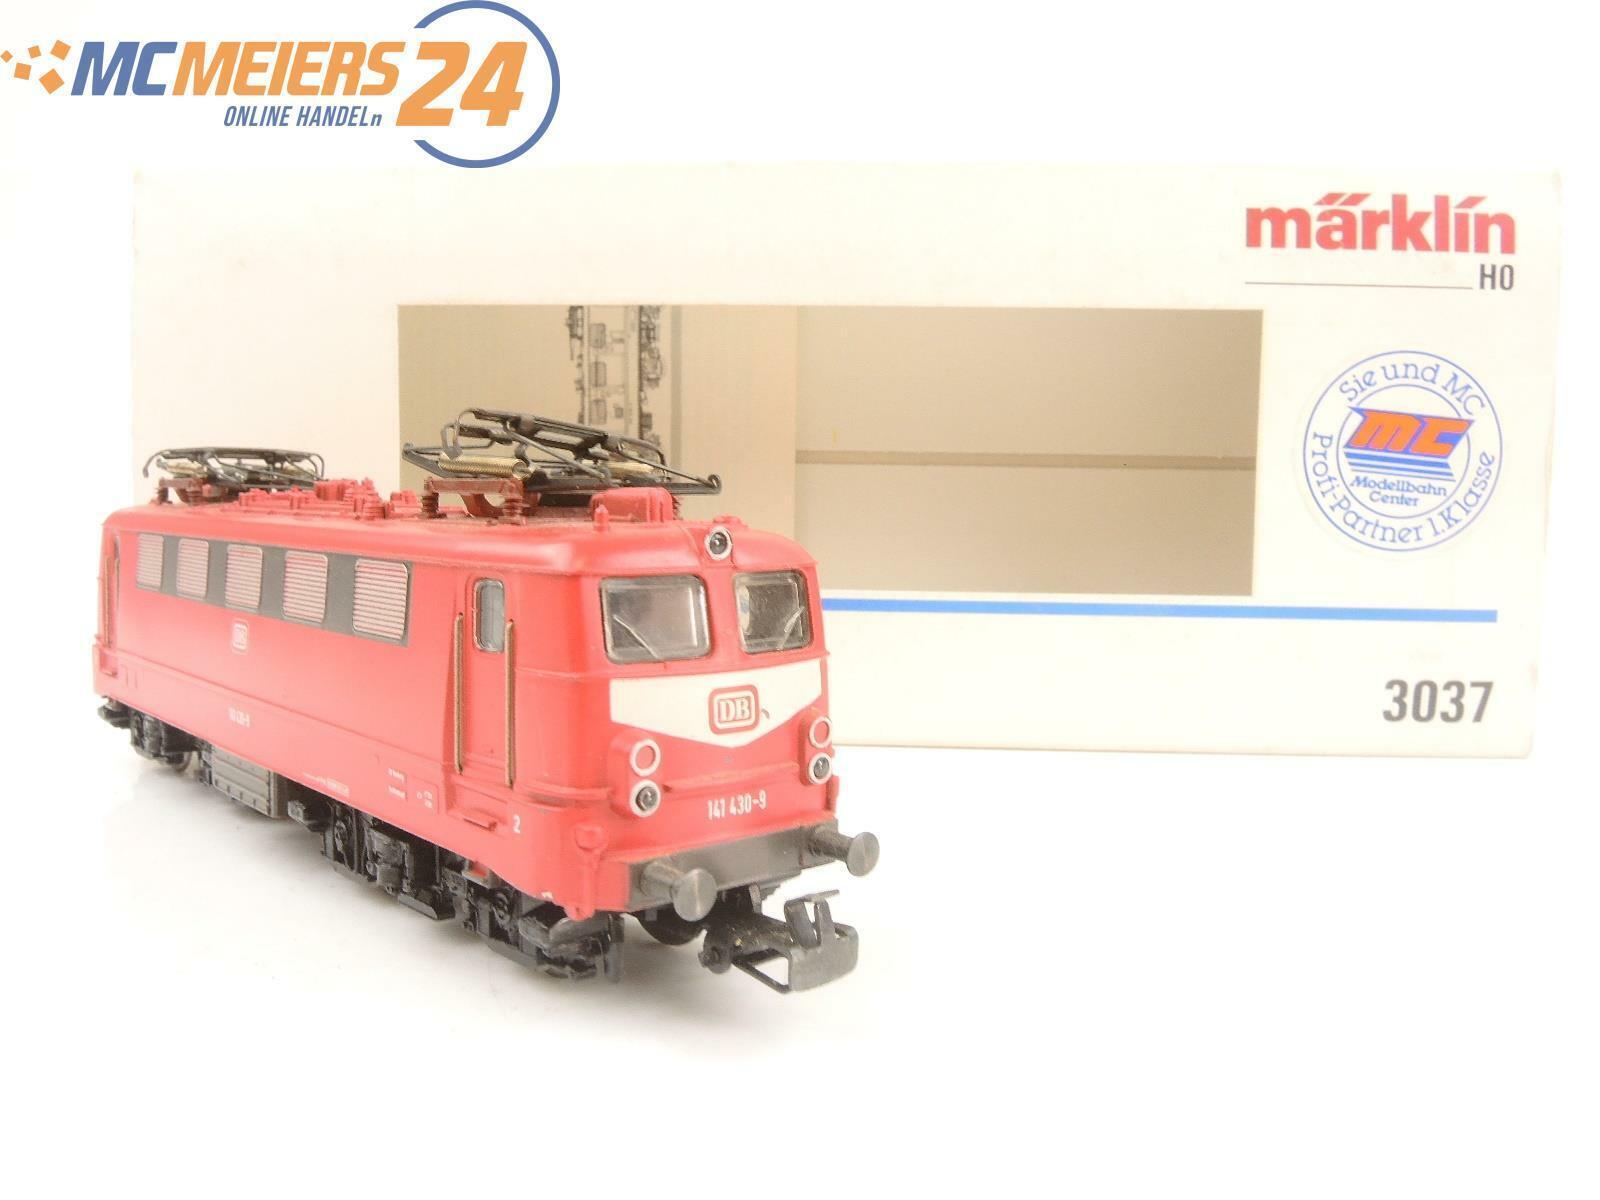 marklin e80a224 h0 3037 Elektrolok ELok BR 141 4309 DB